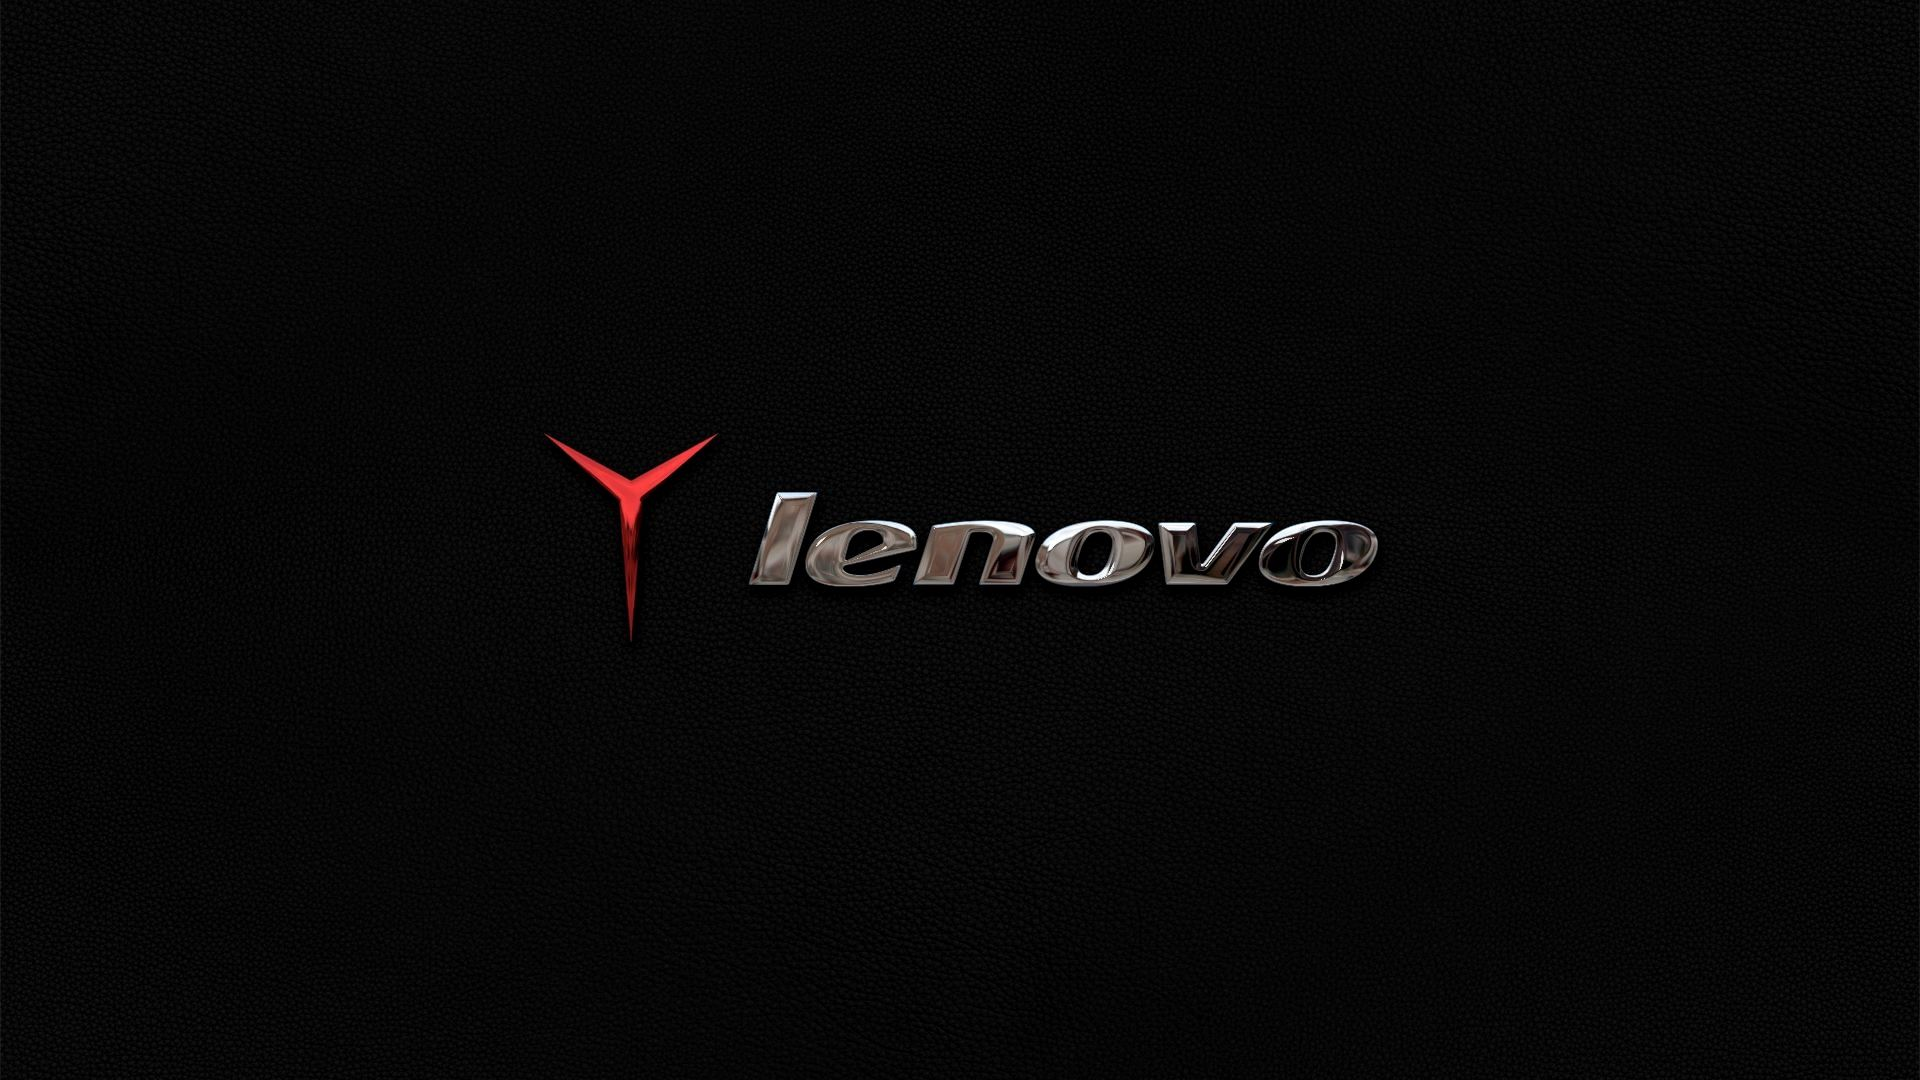 Lenovo Gaming Wallpaper 4k Gallery Seni Gif Seni